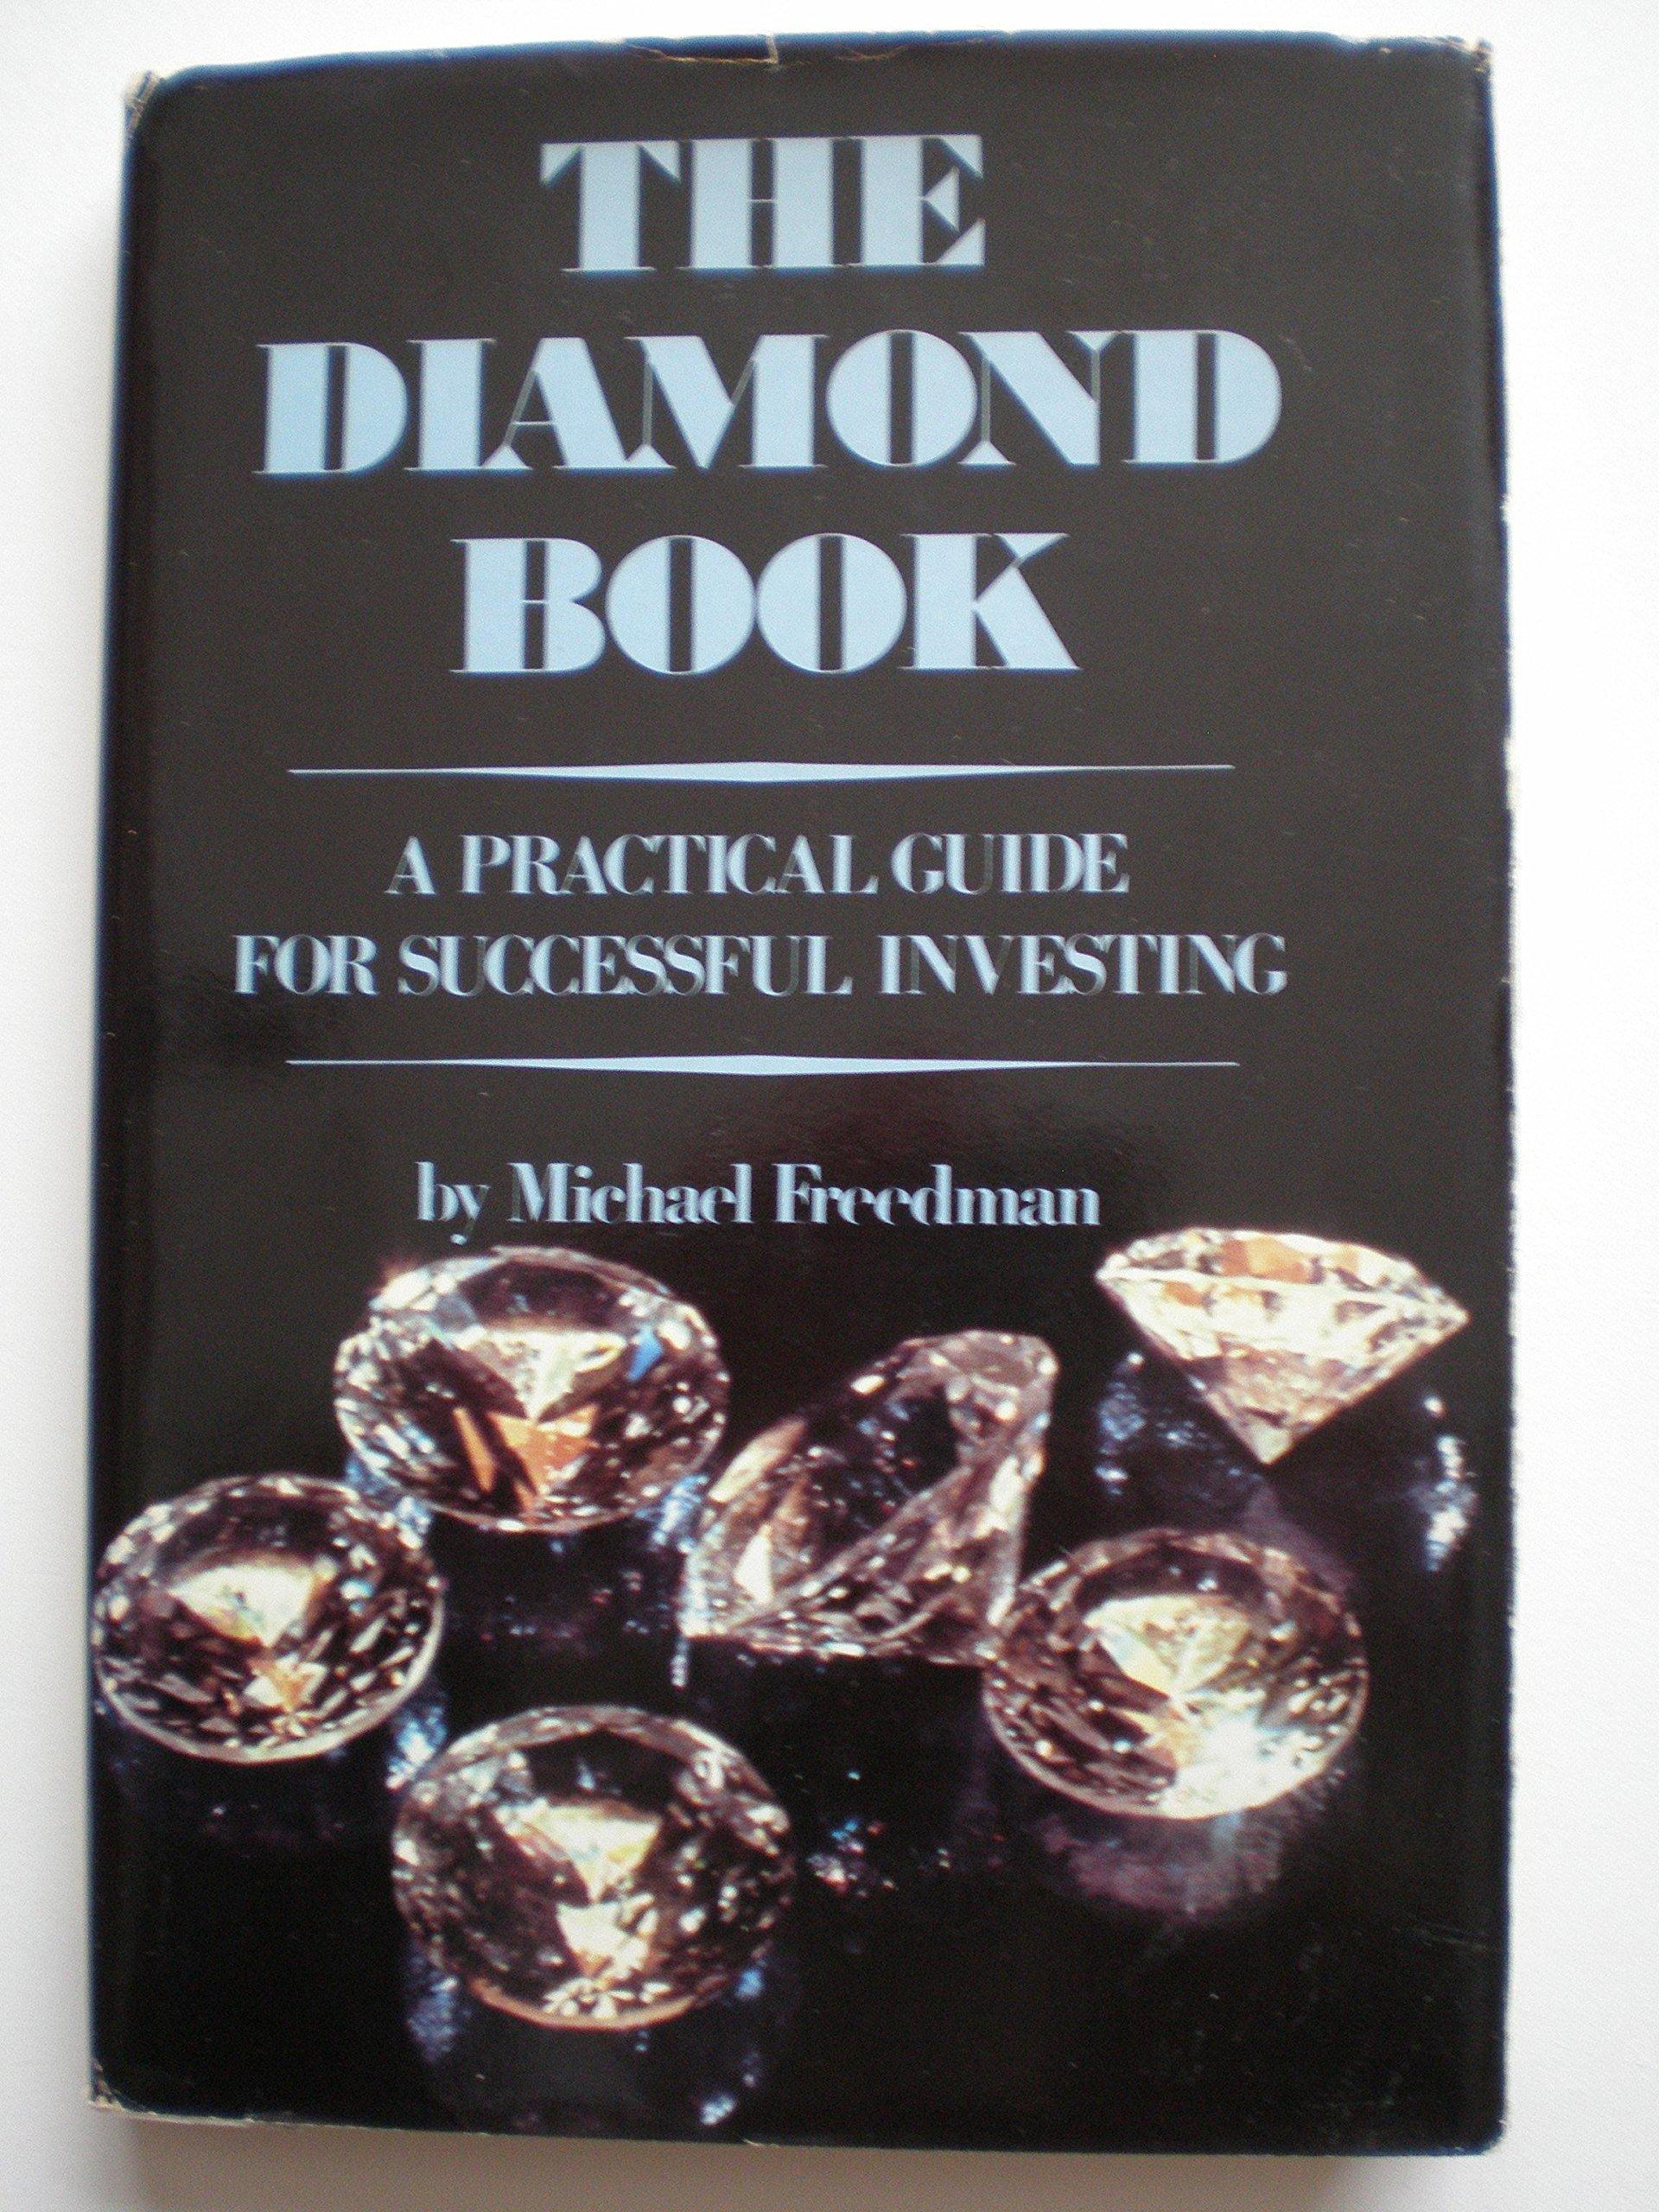 Diamond Dooks